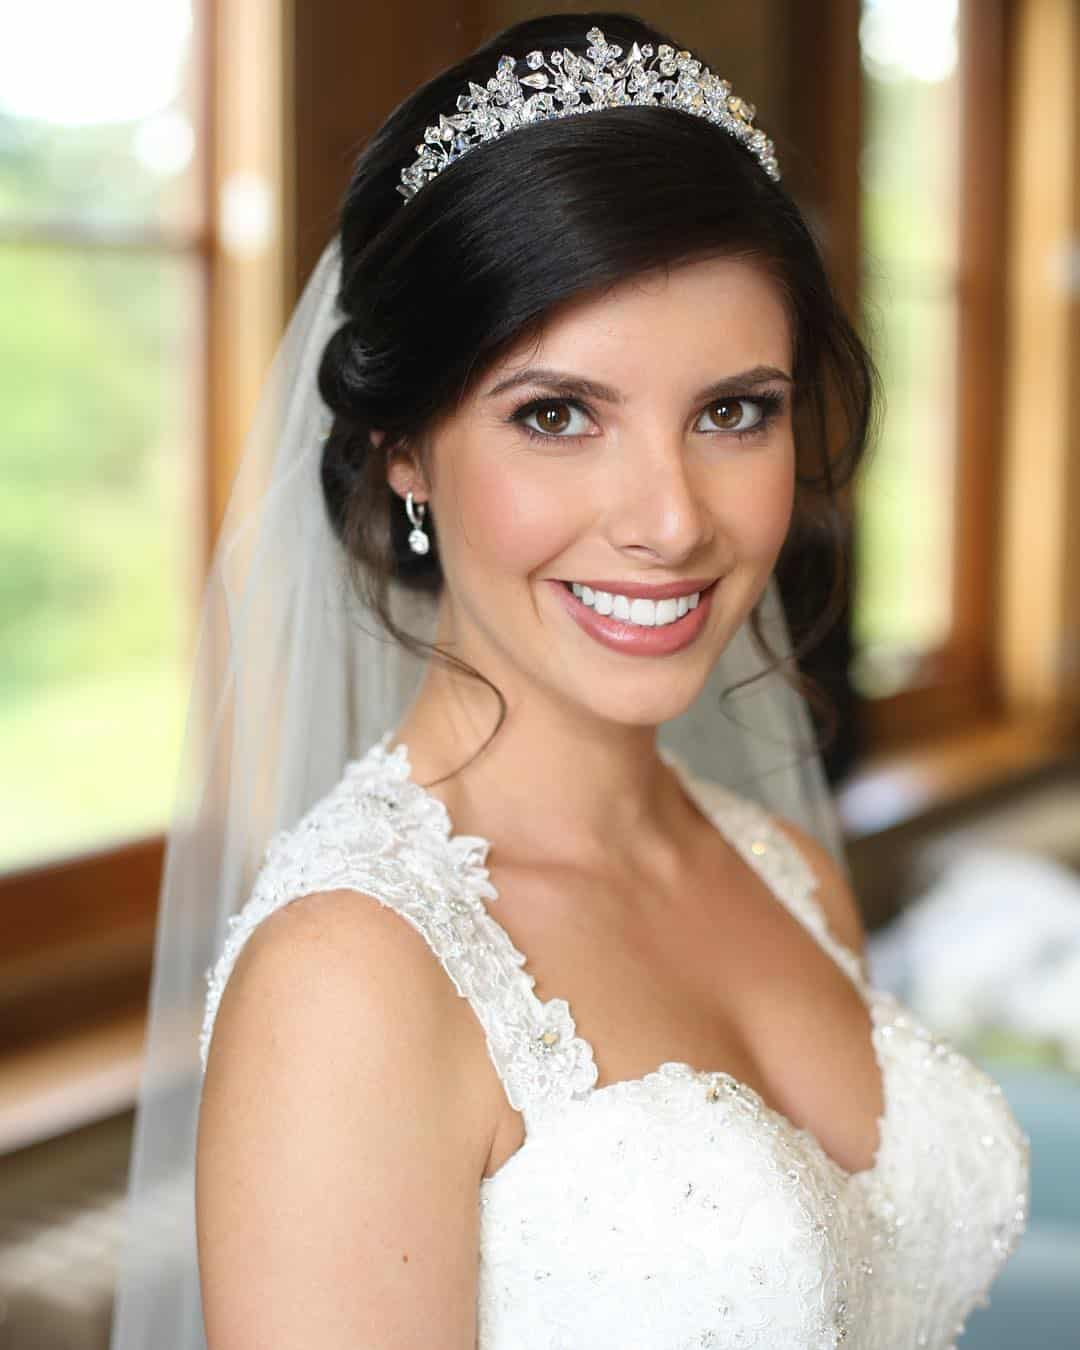 Wedding Hairstyle Trends 2020: Crown, Tiara Or Bridal Wreath? Bridal Trends Of 2020